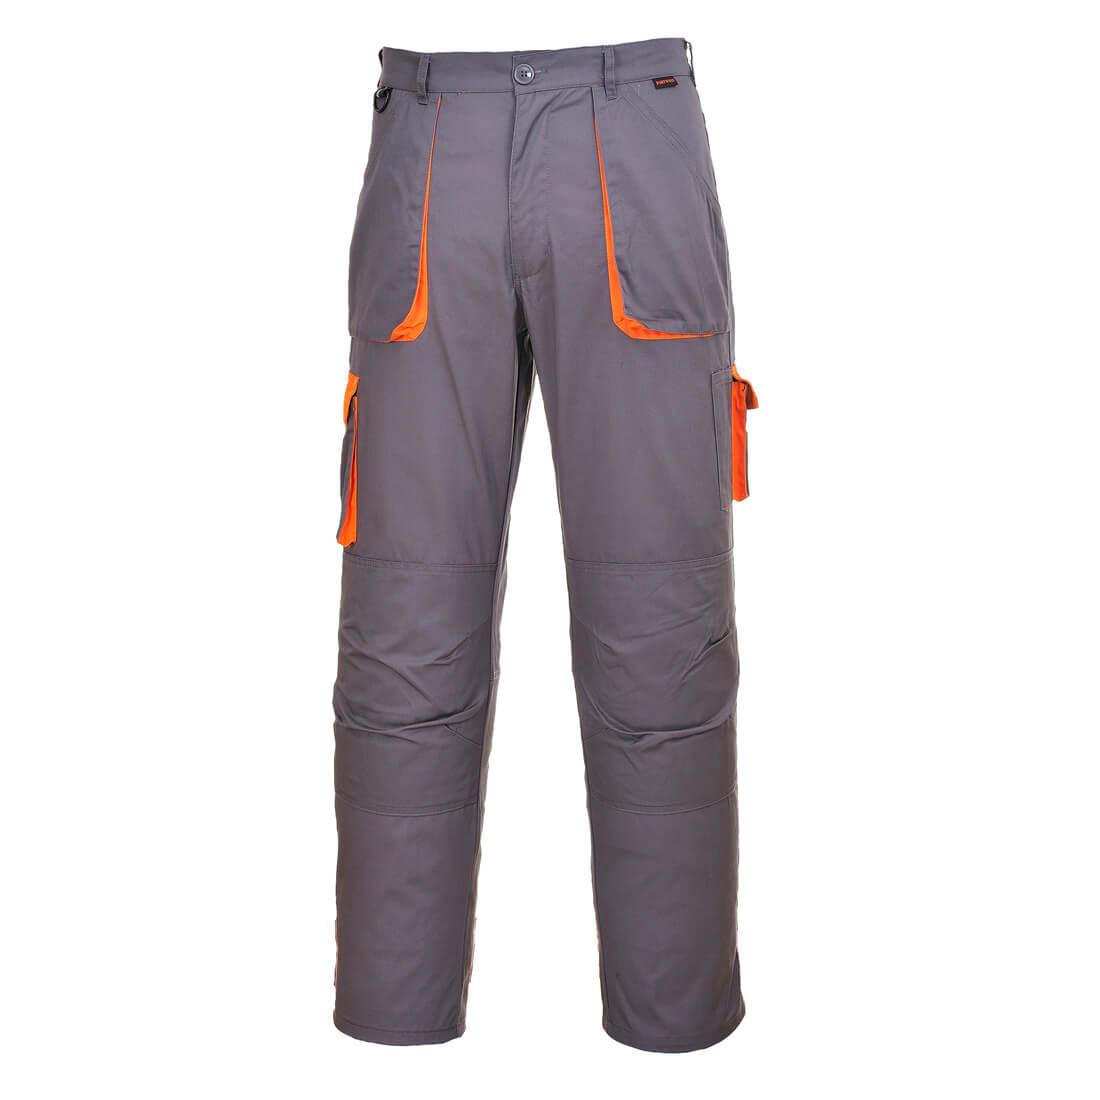 Pantaloni Portwest Texo Contrast - Imbracaminte de protectie